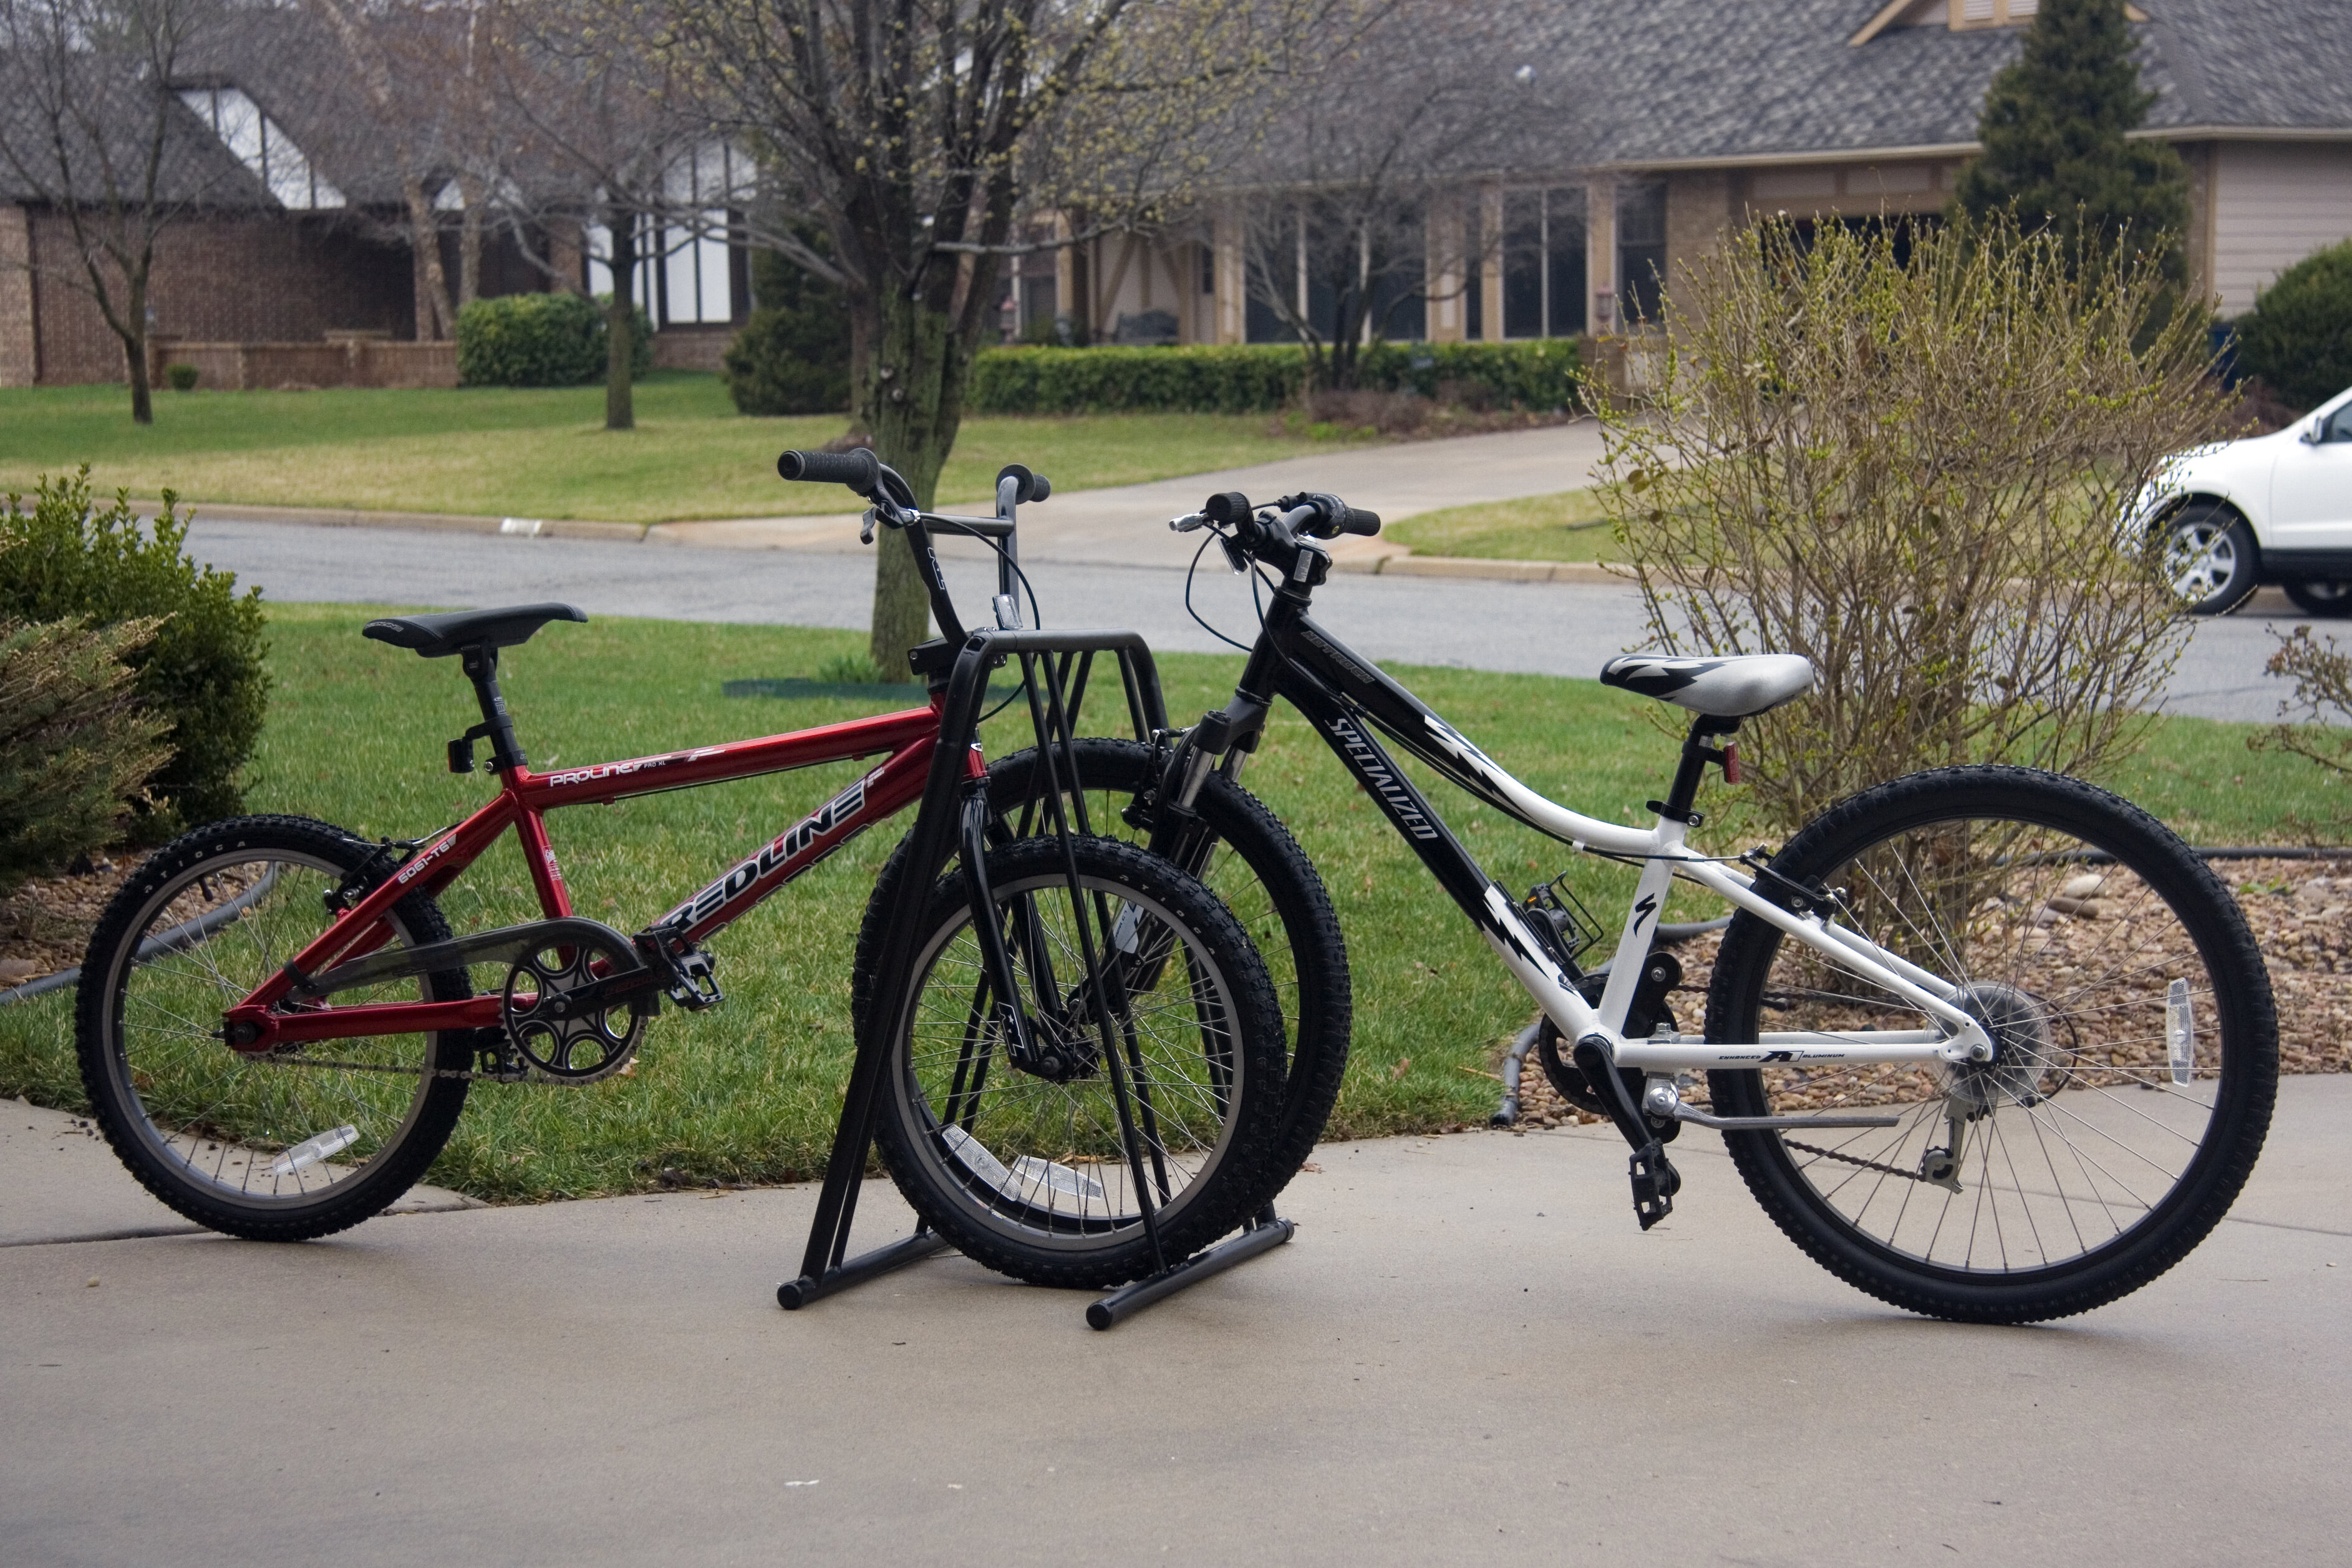 toys shipping free bike product sports rack black today sportsrack overstock steel advantage glideaway elite